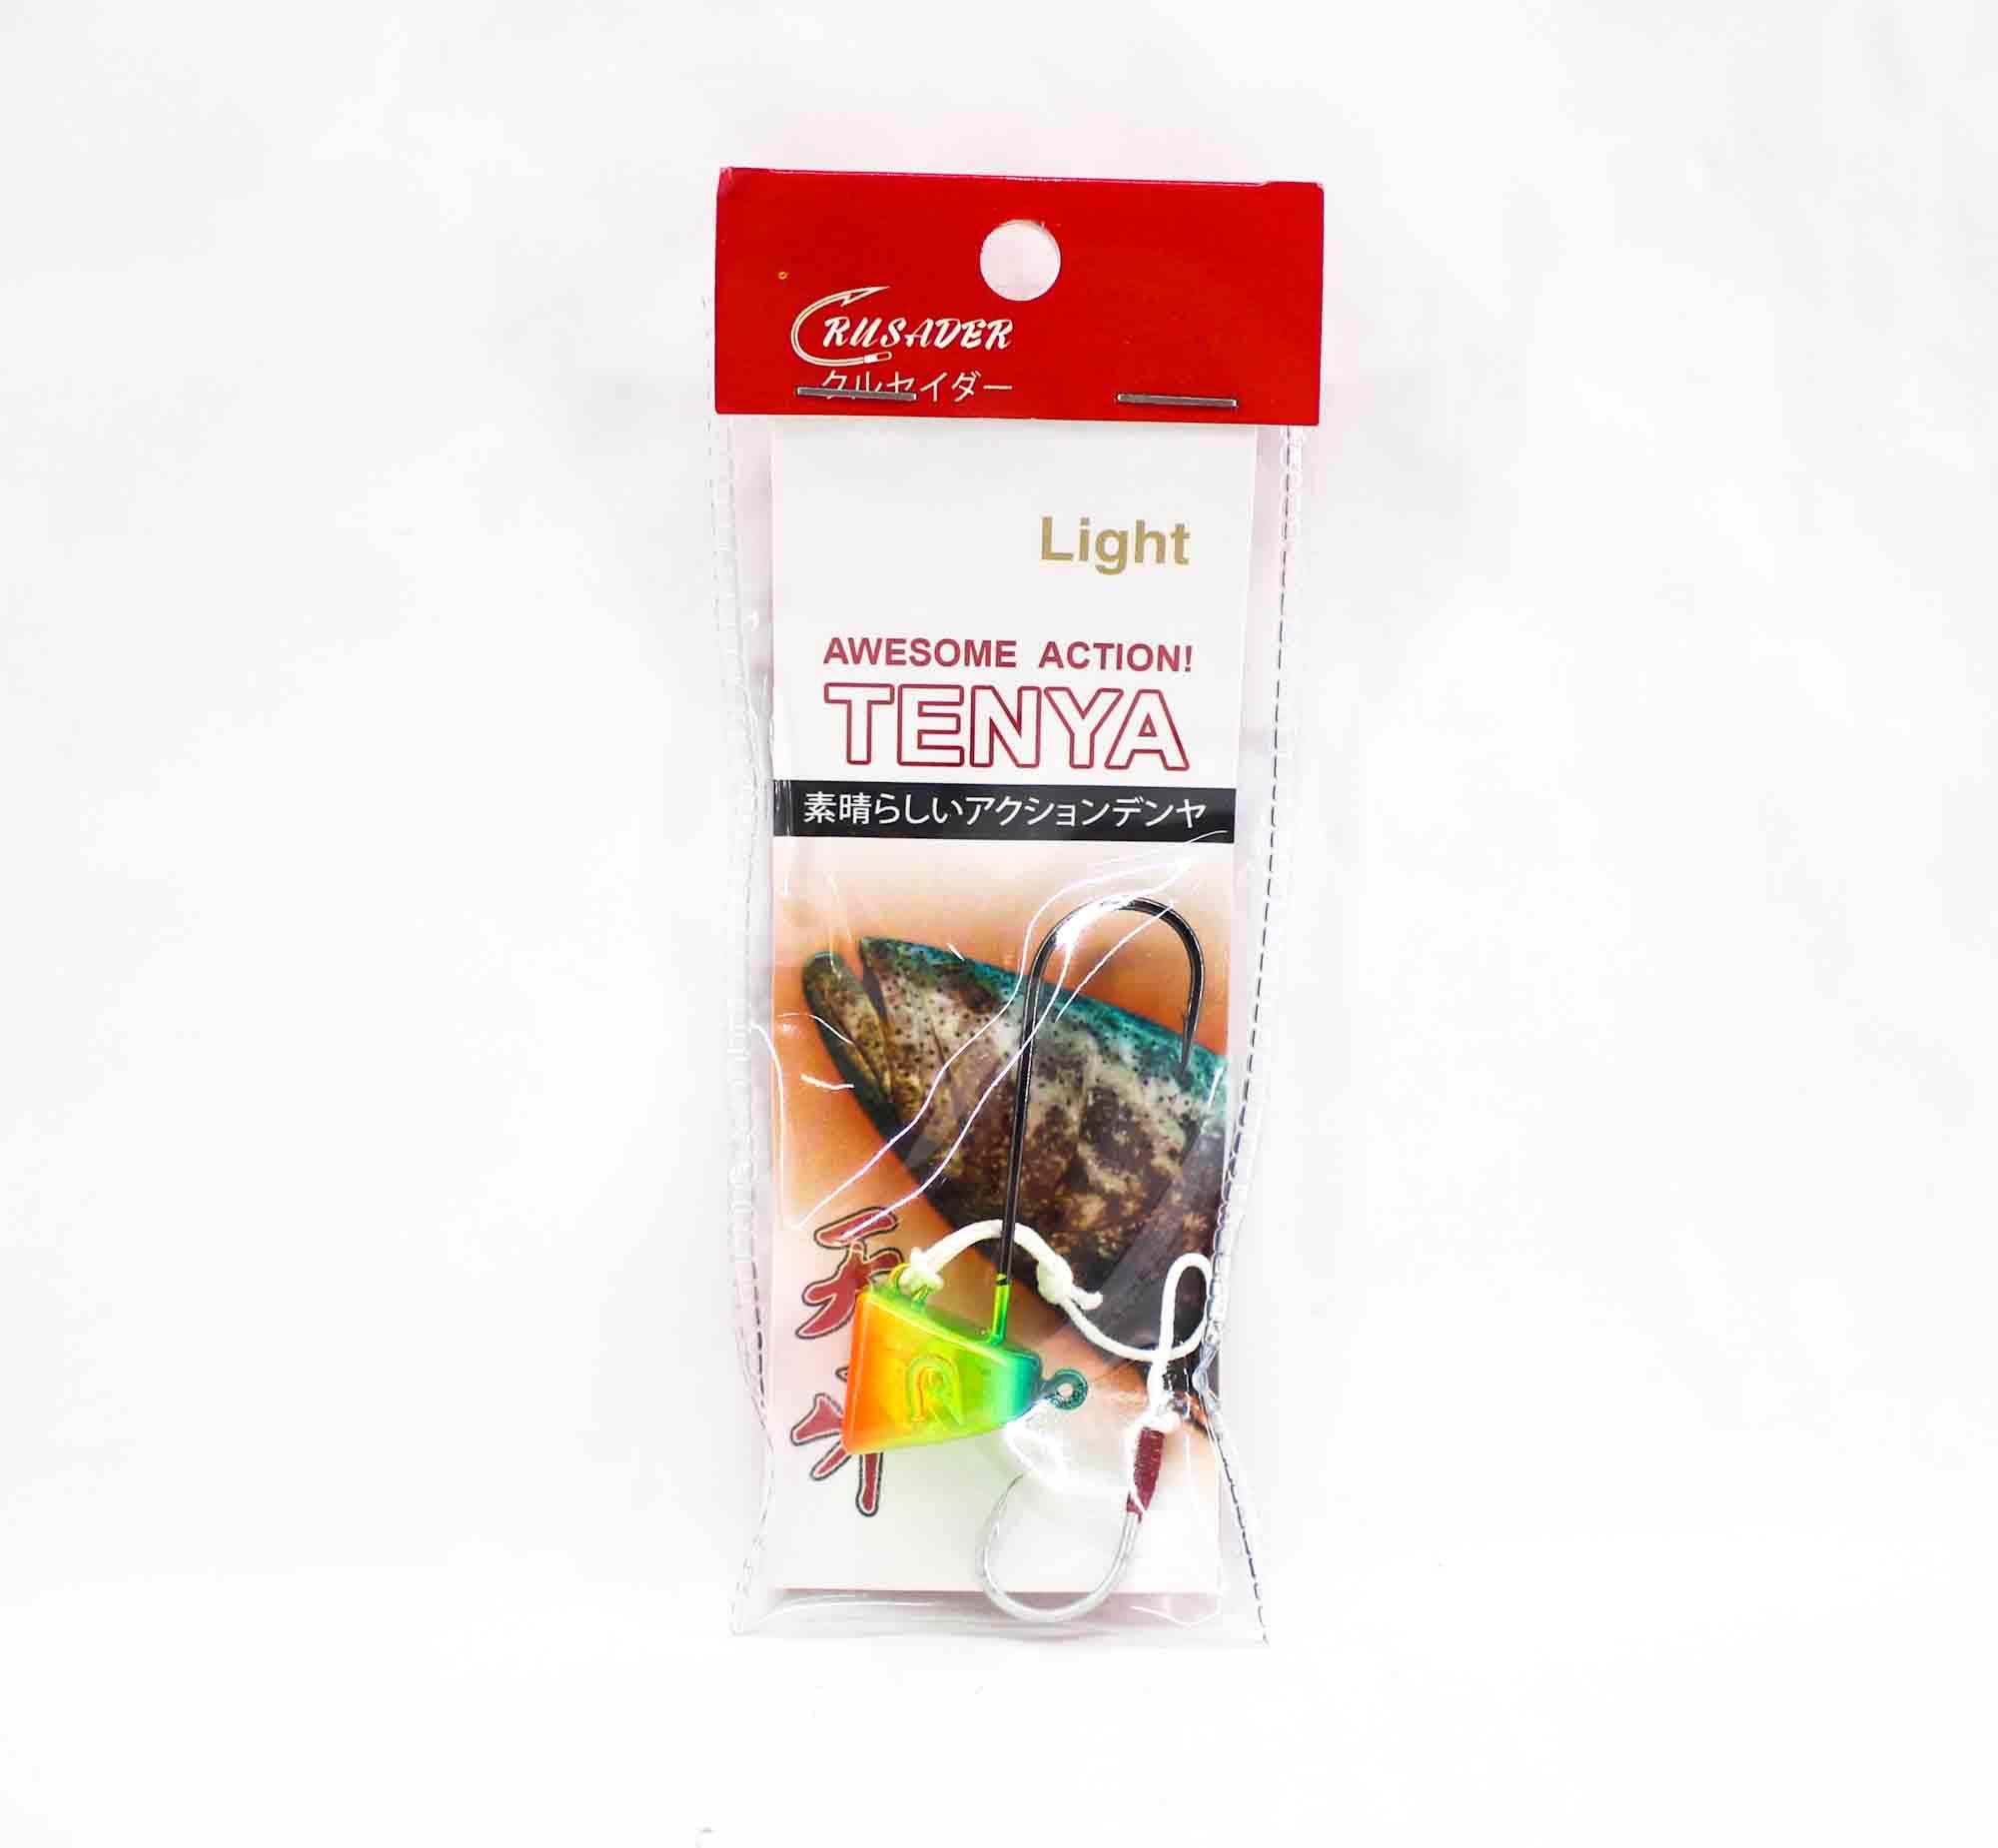 Crusader Tenya Light Bait Rig 40 grams Green Orange (3044)